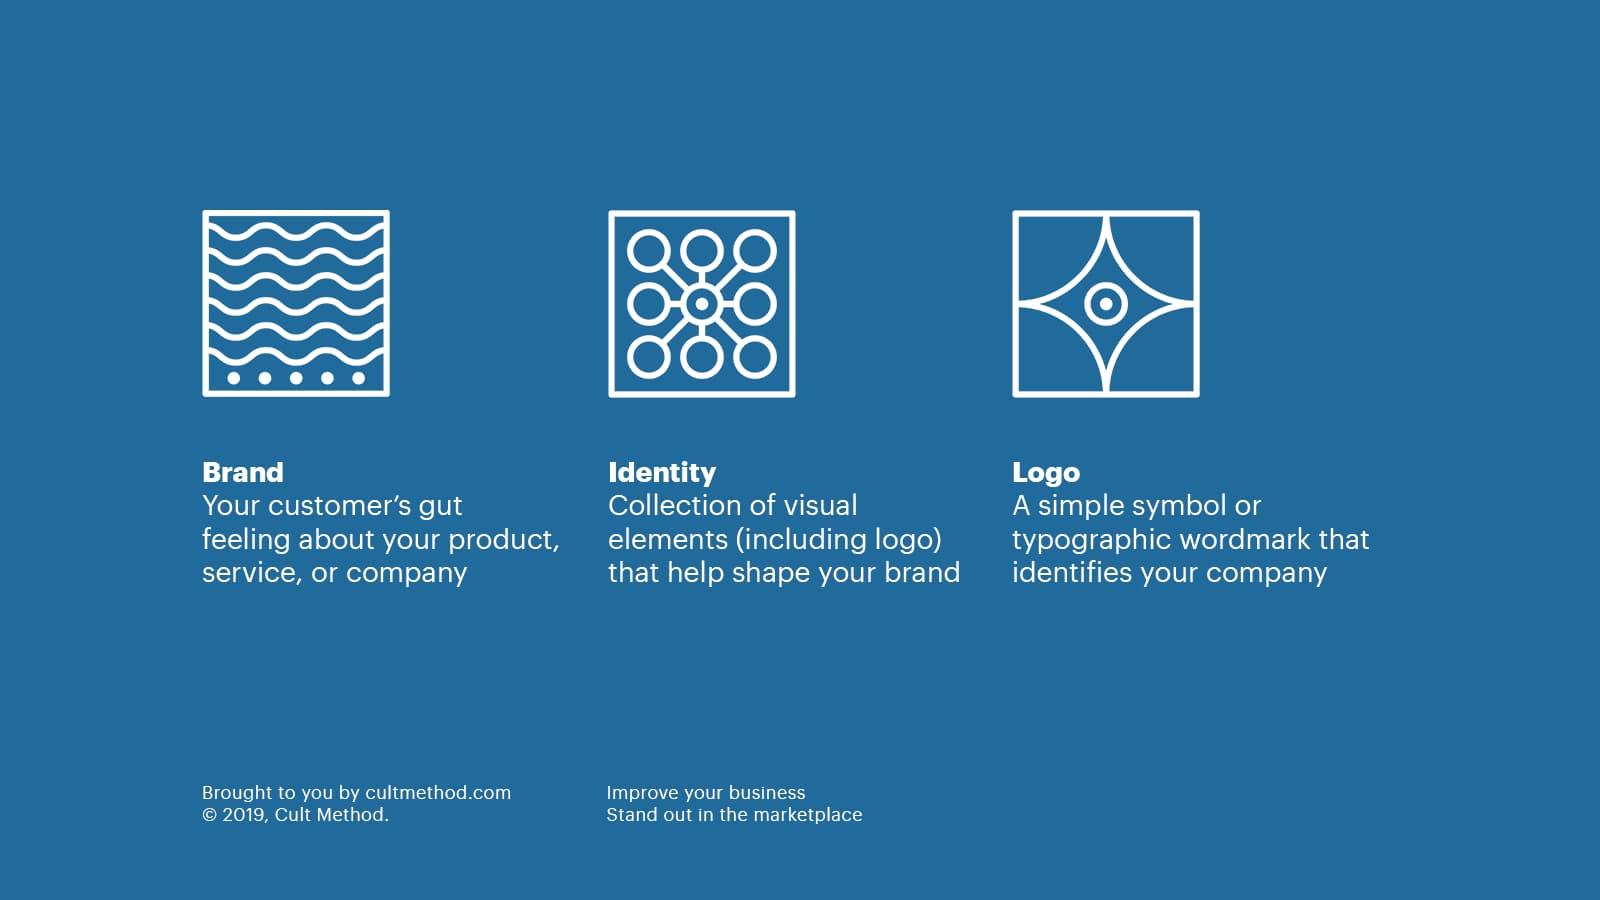 Brand vs Visual Identity vs Logo